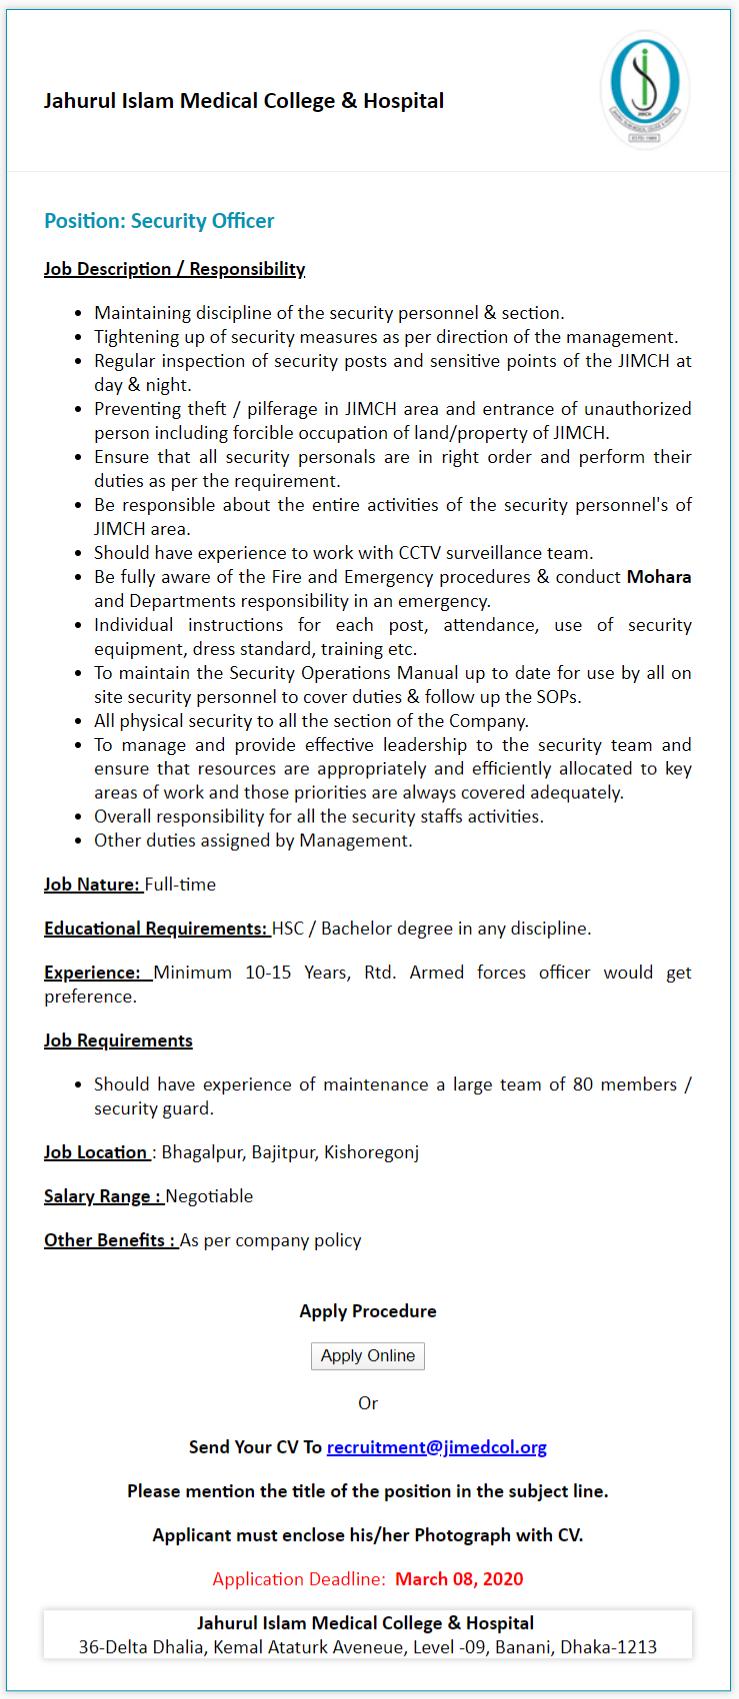 Jahurul Islam Medical College & Hospital Job Circular 2020